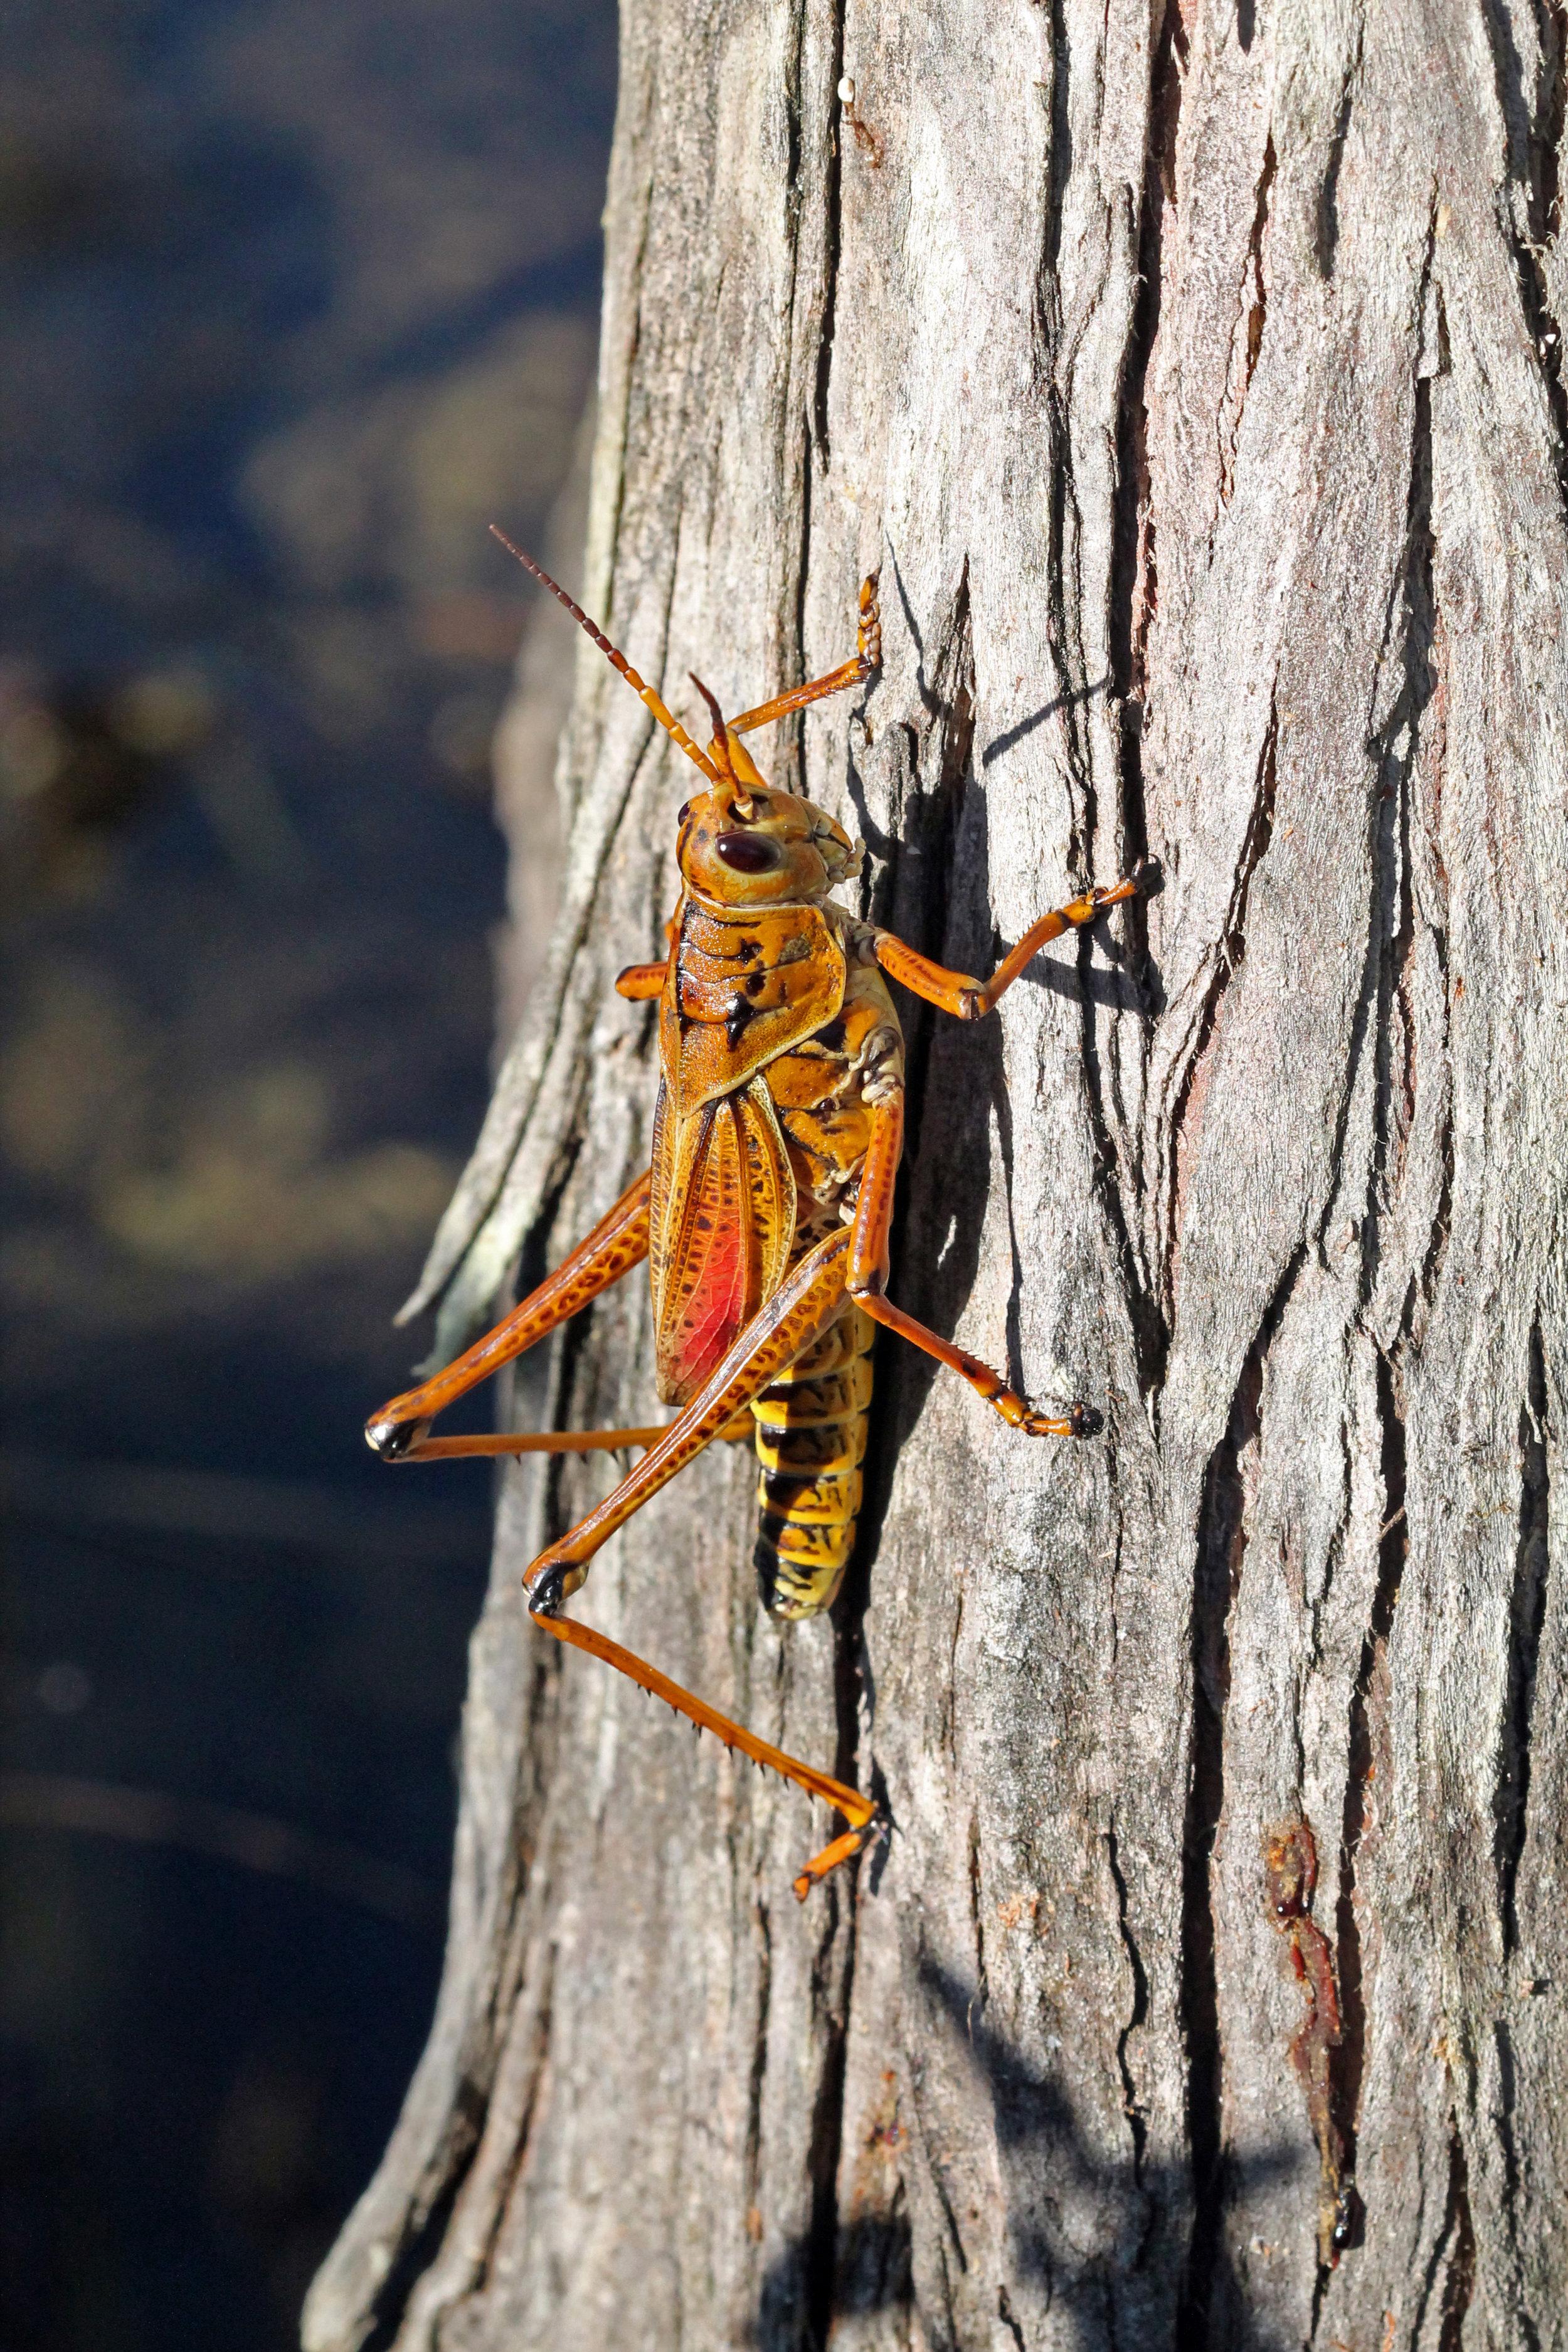 Romalea microptera in Big Cypress National Preserve, Florida 2014